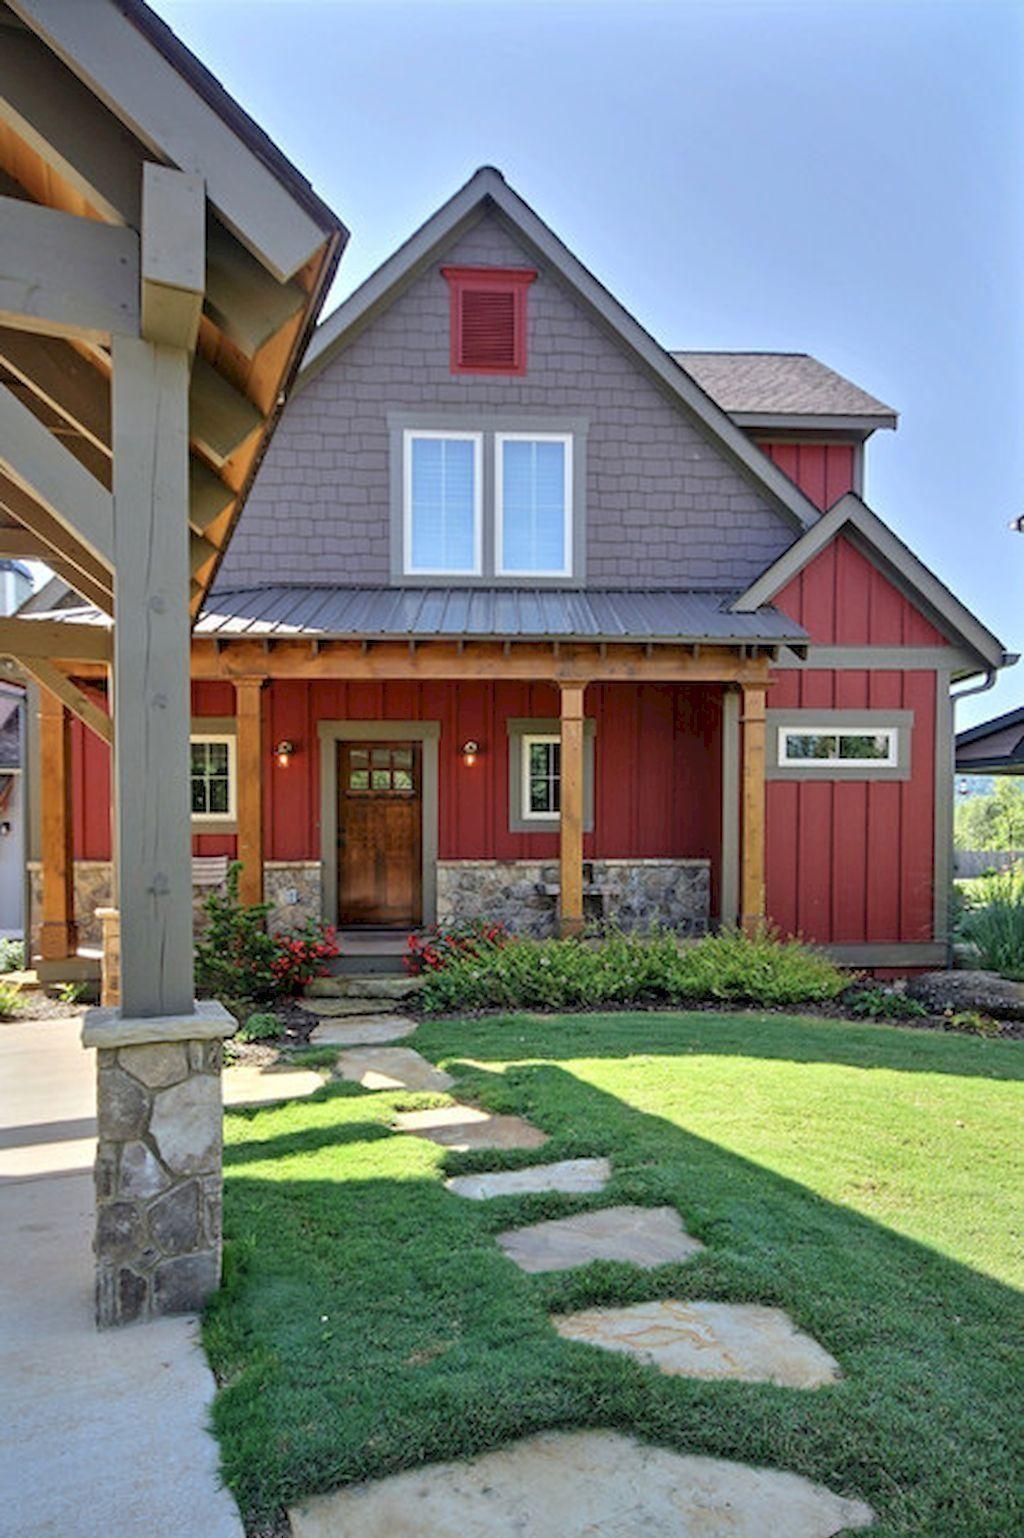 Modern Farmhouse Exterior Designs Ideas 40 | Modern ...